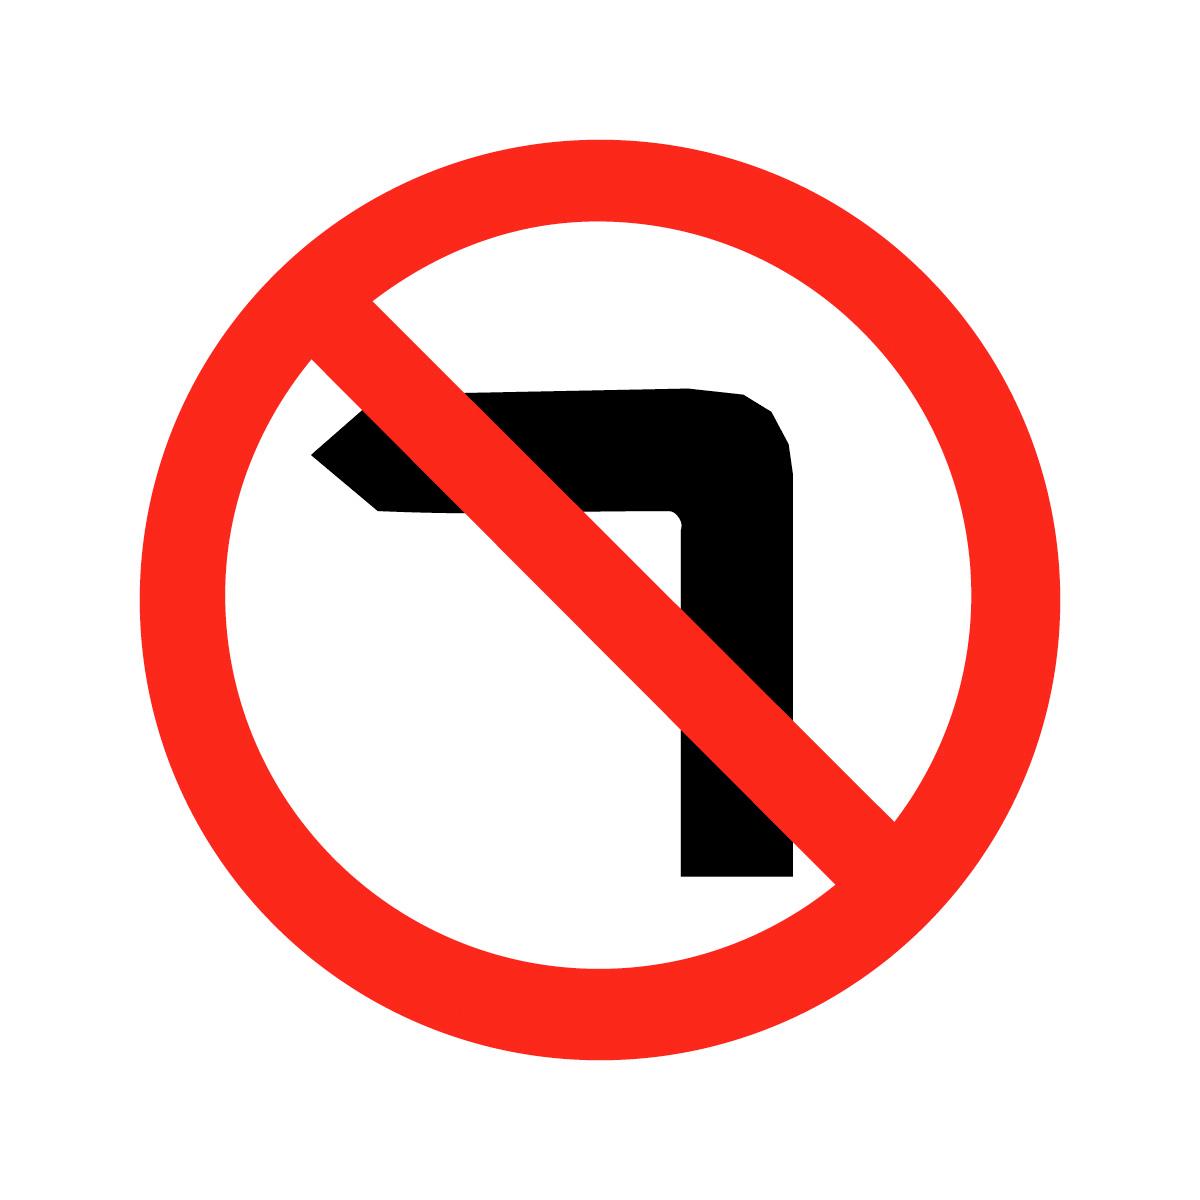 No Left Turn Safety Sign.